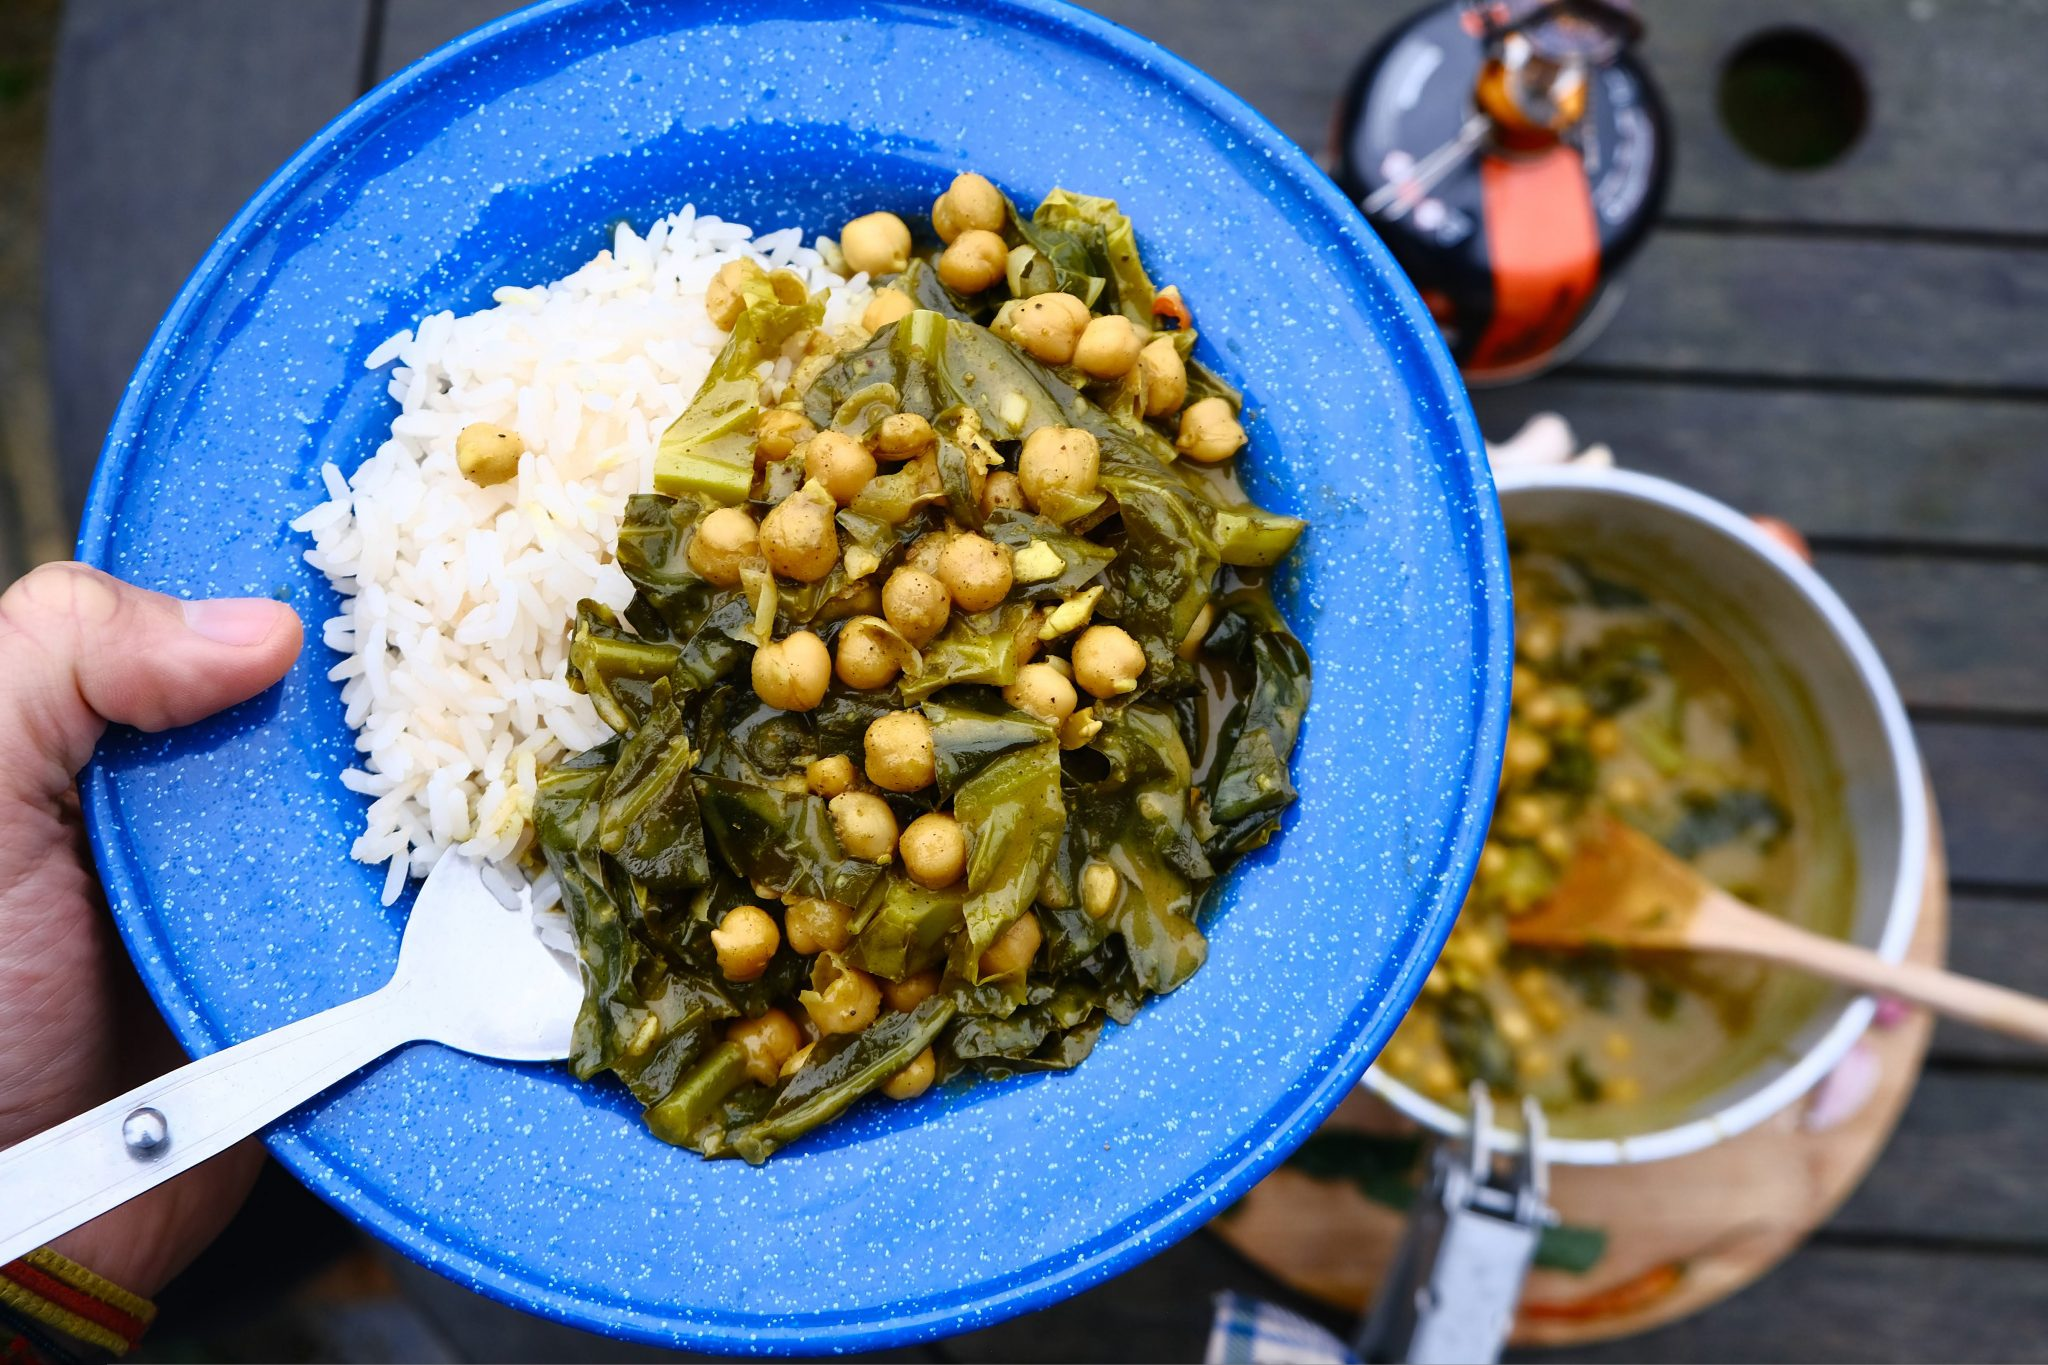 vegan camping recipe with chickpeas